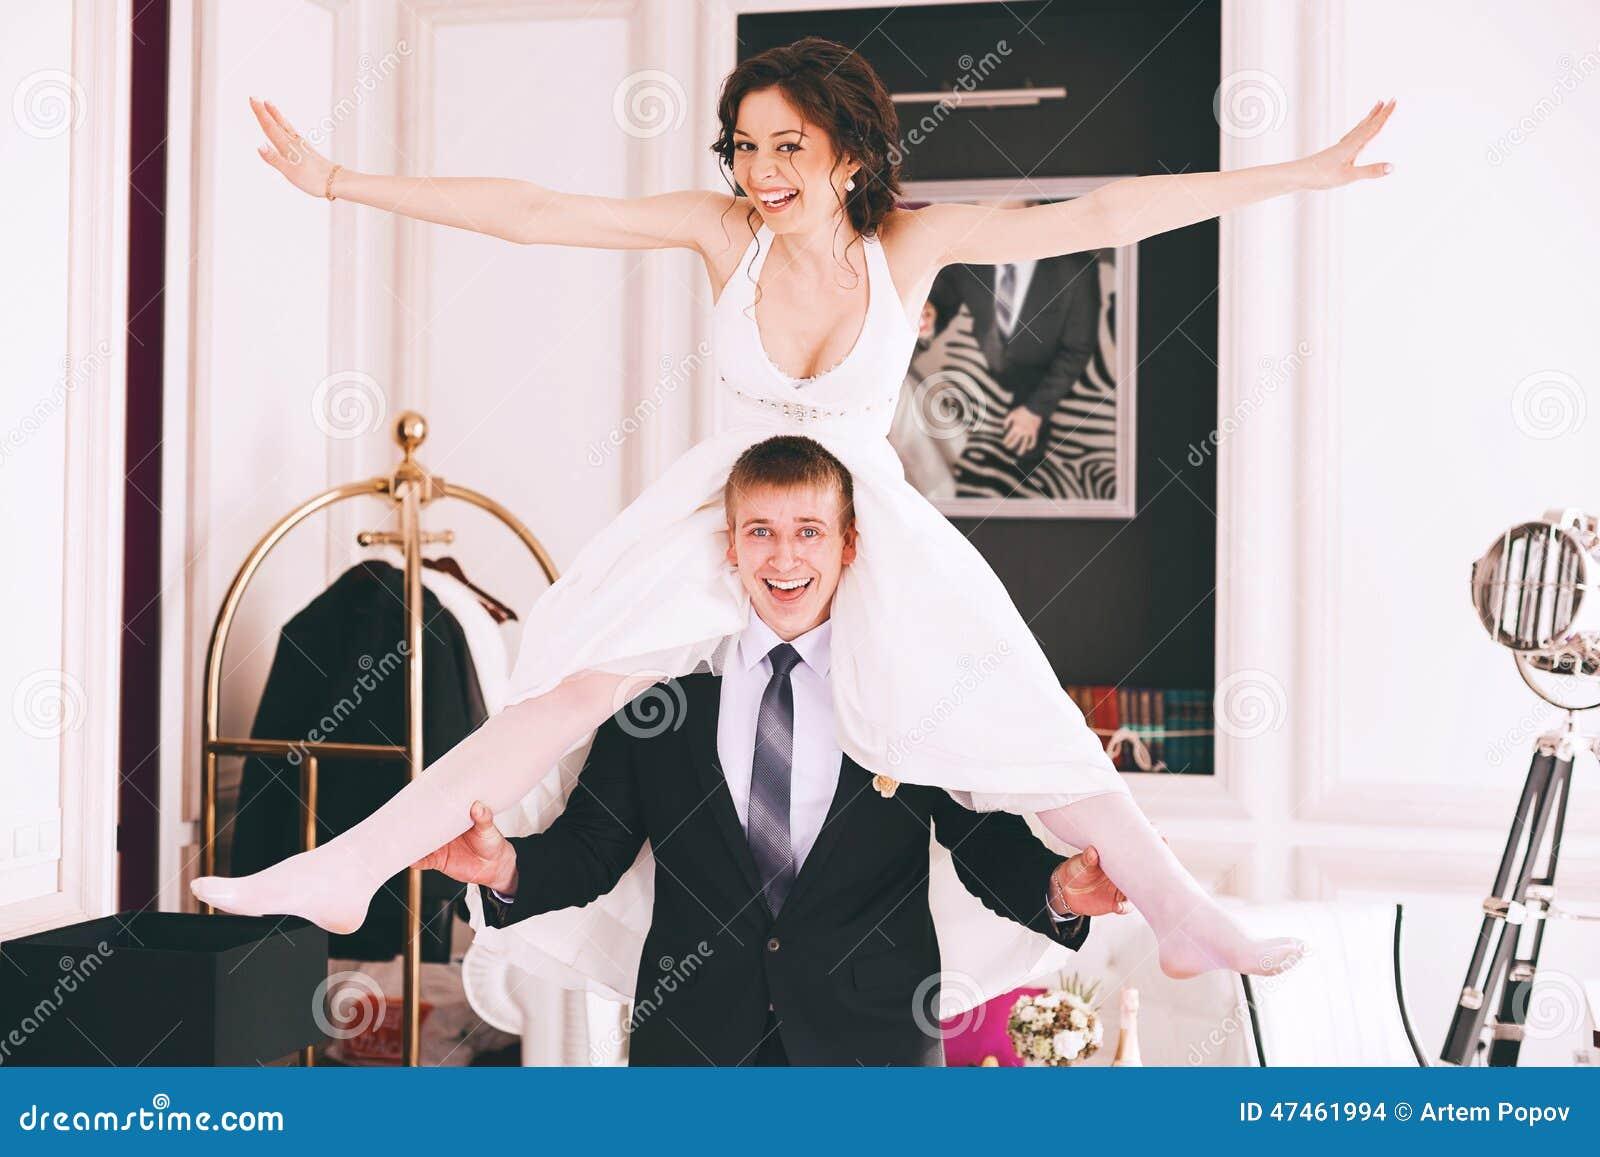 Happy Funny Bride Sitting On Groom Shoulders Stock Photo